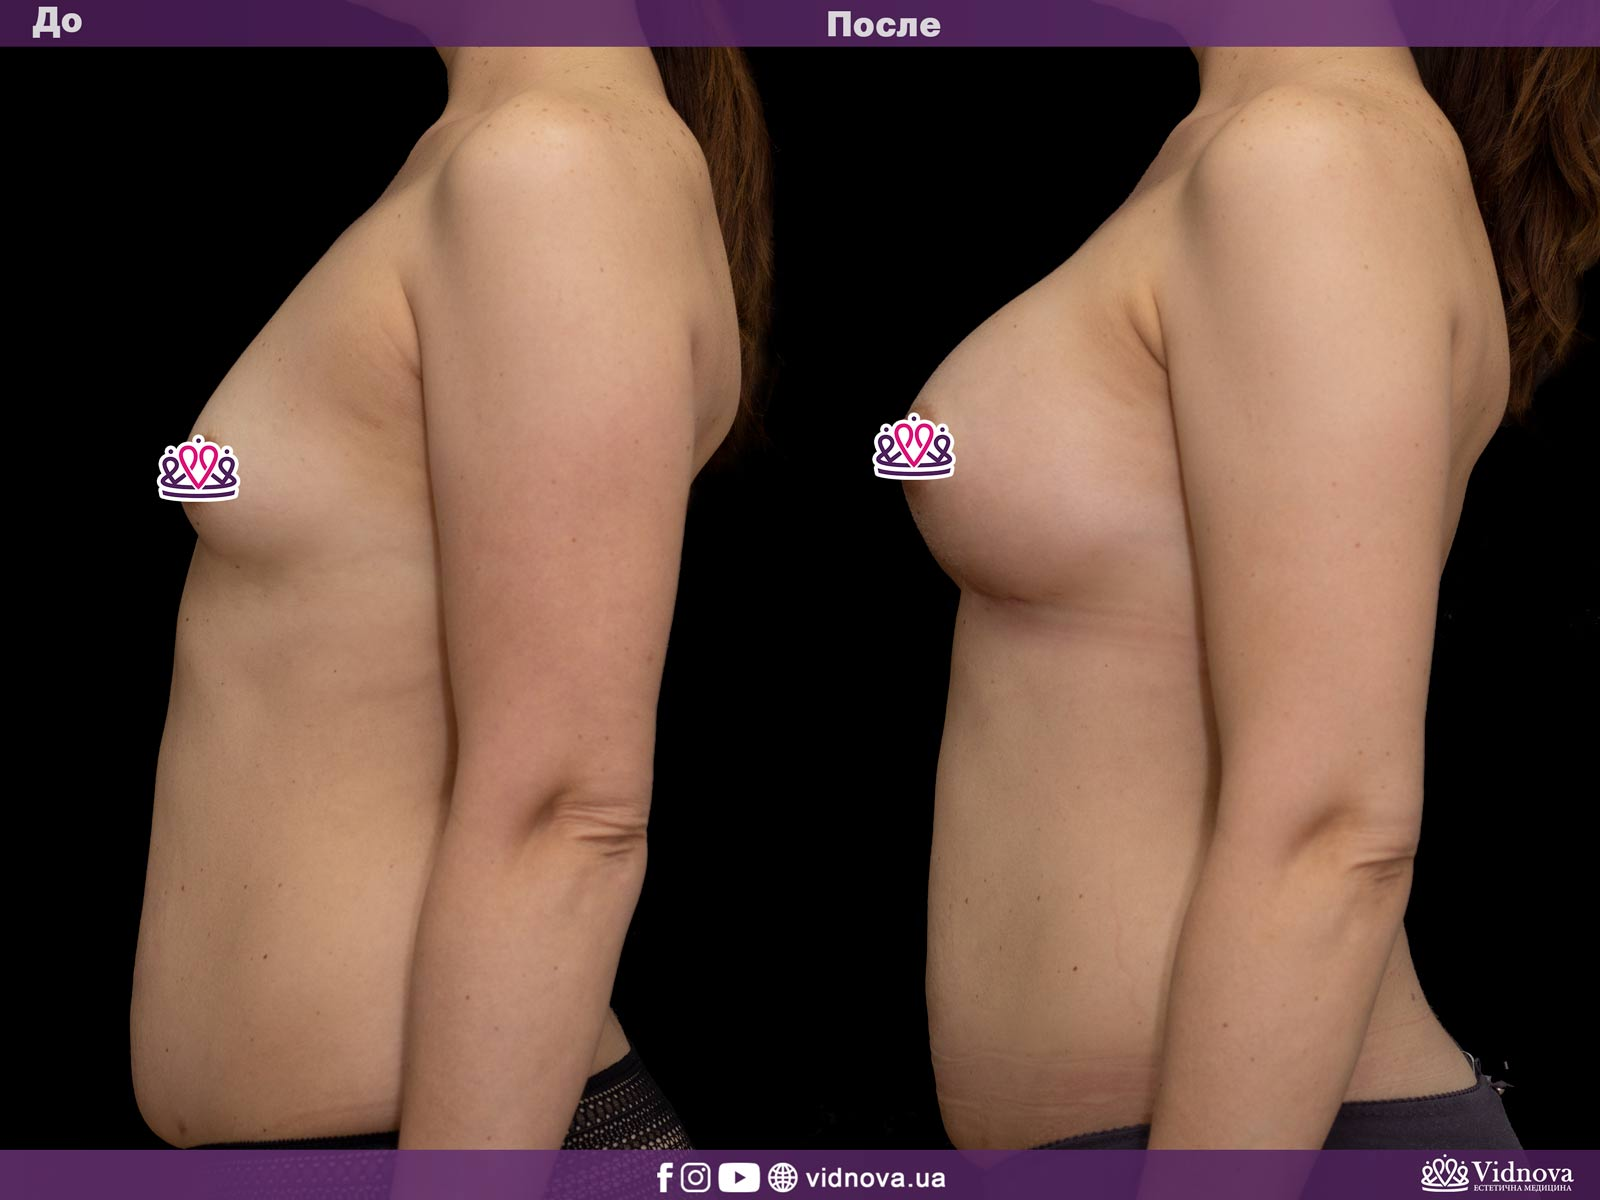 Увеличение груди: Фото ДО и ПОСЛЕ - Пример №23-3 - Клиника Vidnova